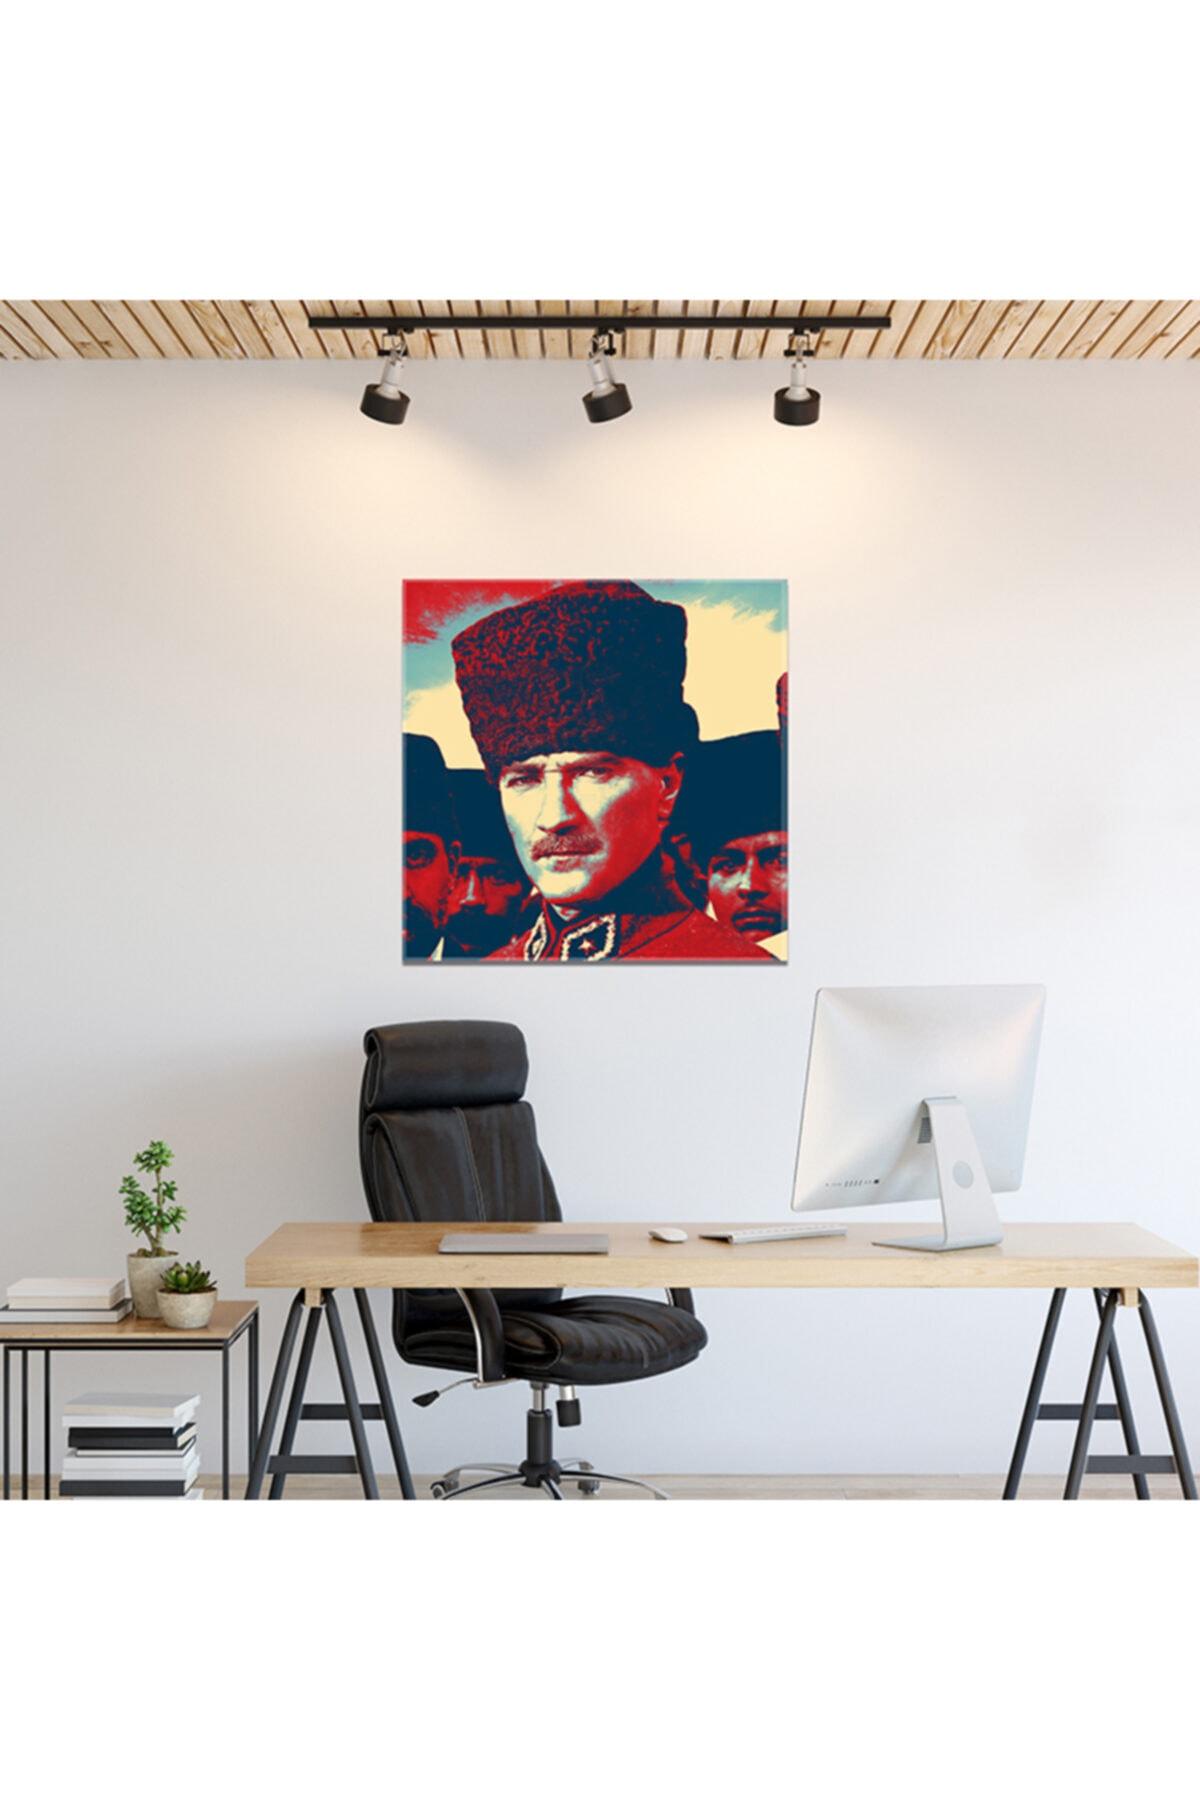 PabloFi Gazi Mustafa Kemal Atatürk Kalpaklı Efektli Kanvas Tablo 2